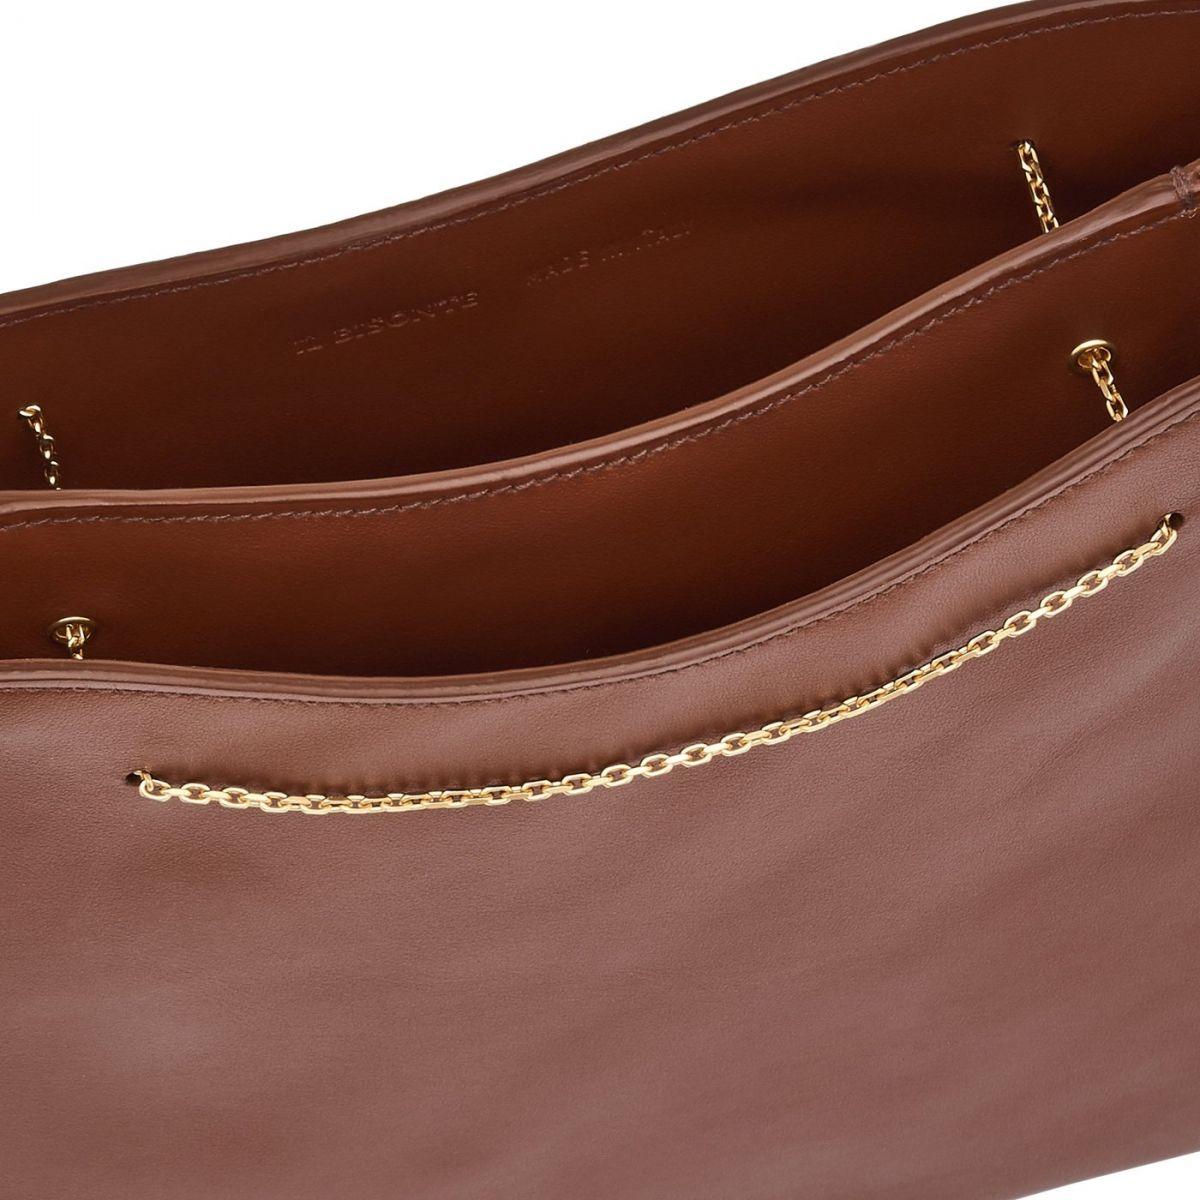 Giglio - Women's Shoulder Bag Mediterranea in Calf Leather BSH132 color Tobacco | Details